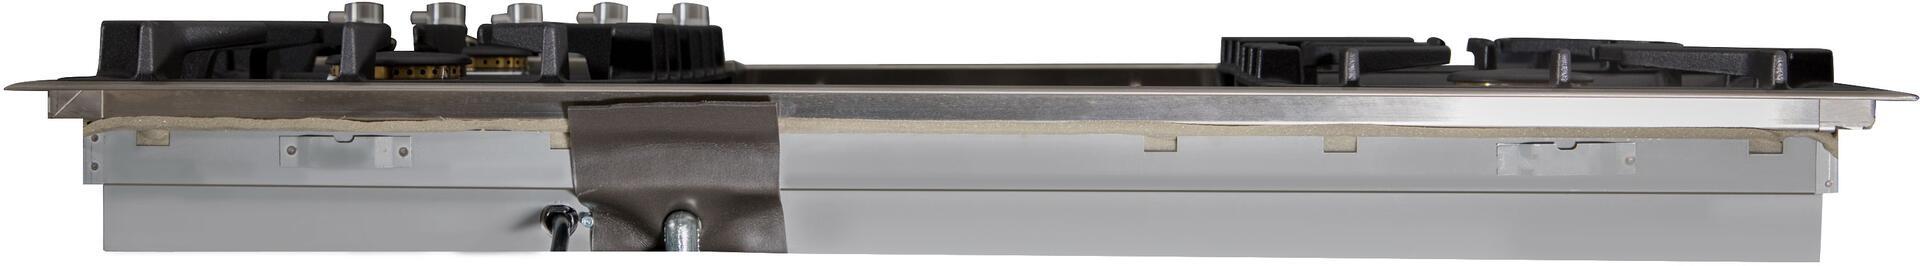 Ilve  UXLP90FI Gas Cooktop Stainless Steel, UXLP90FI Back View